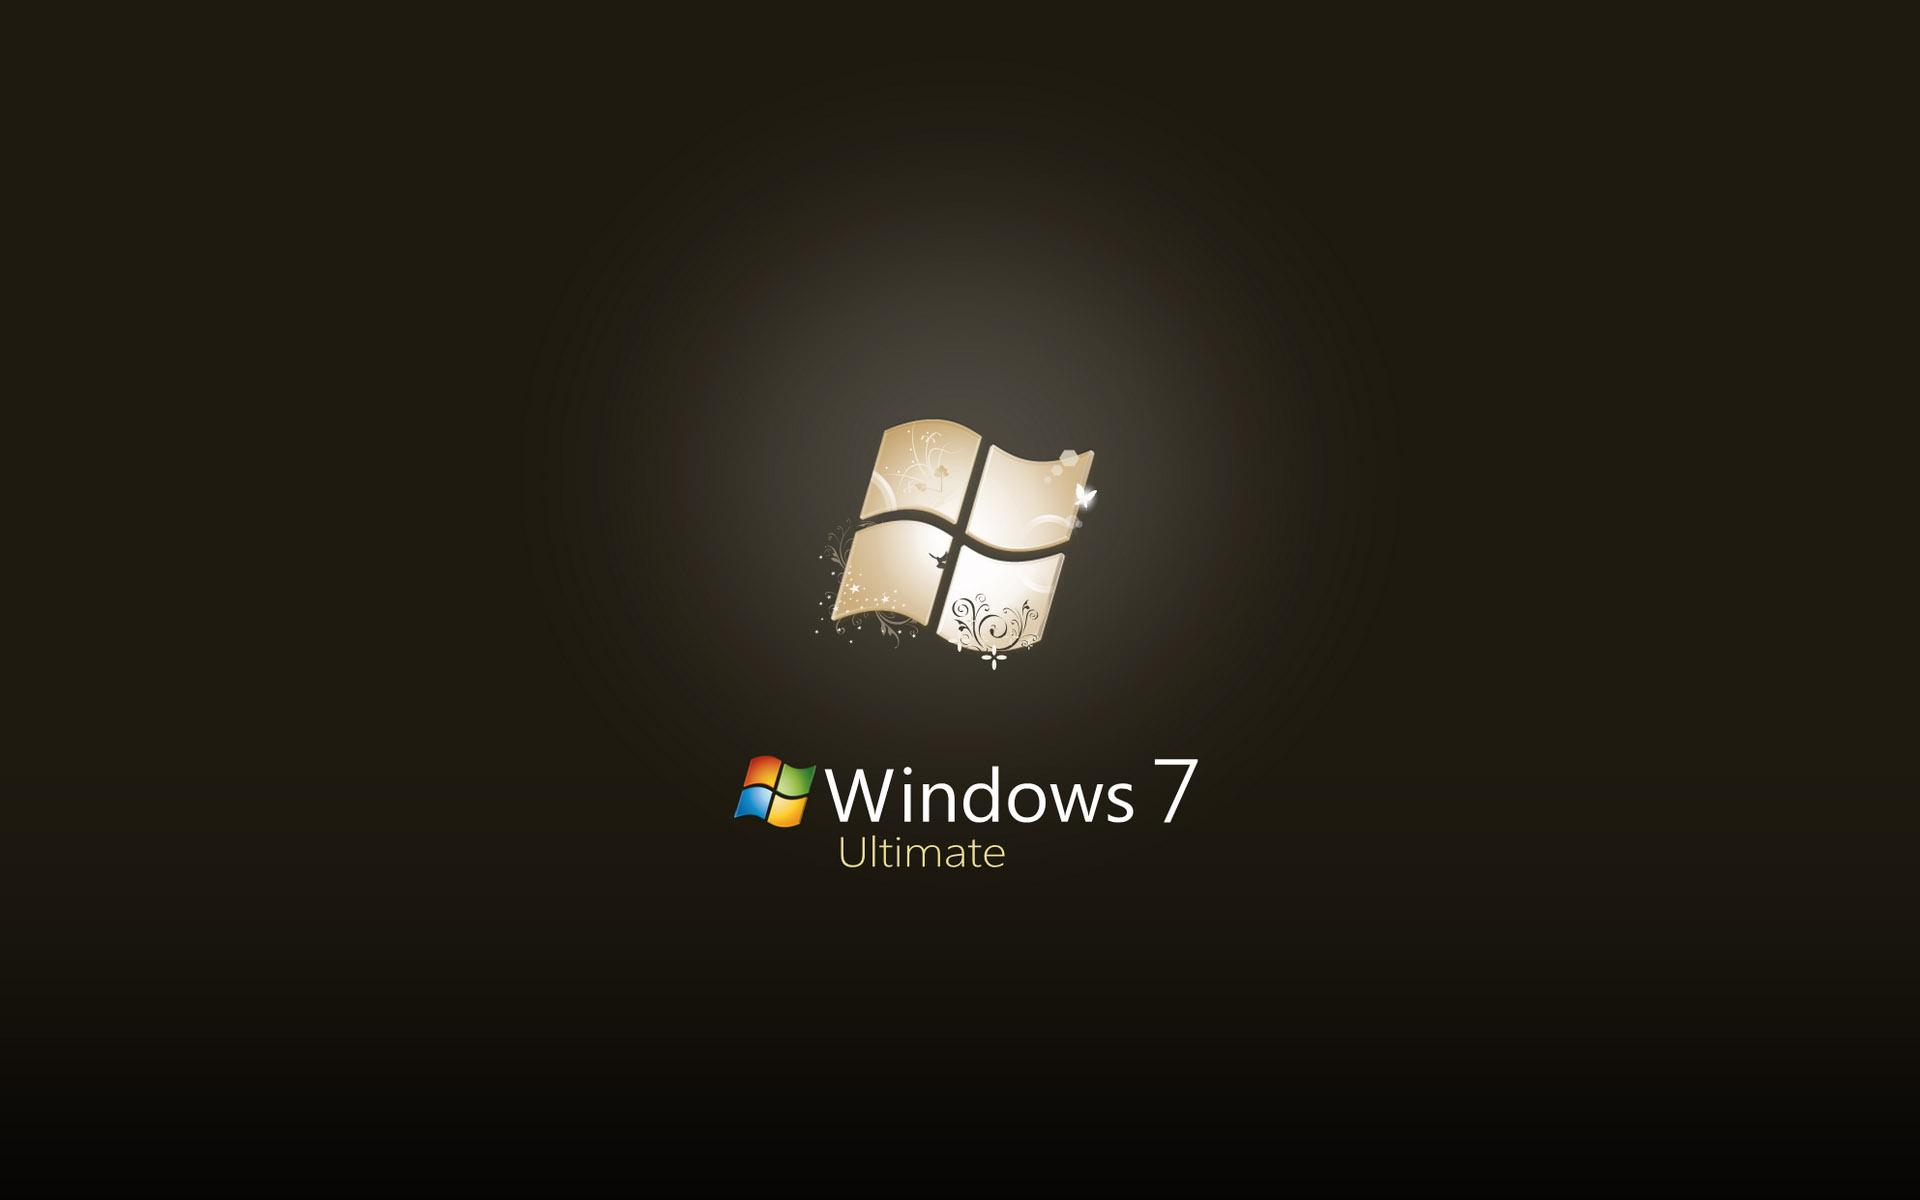 Hot Windows 7 Background   Windows 7 Wallpaper 26875303 1920x1200